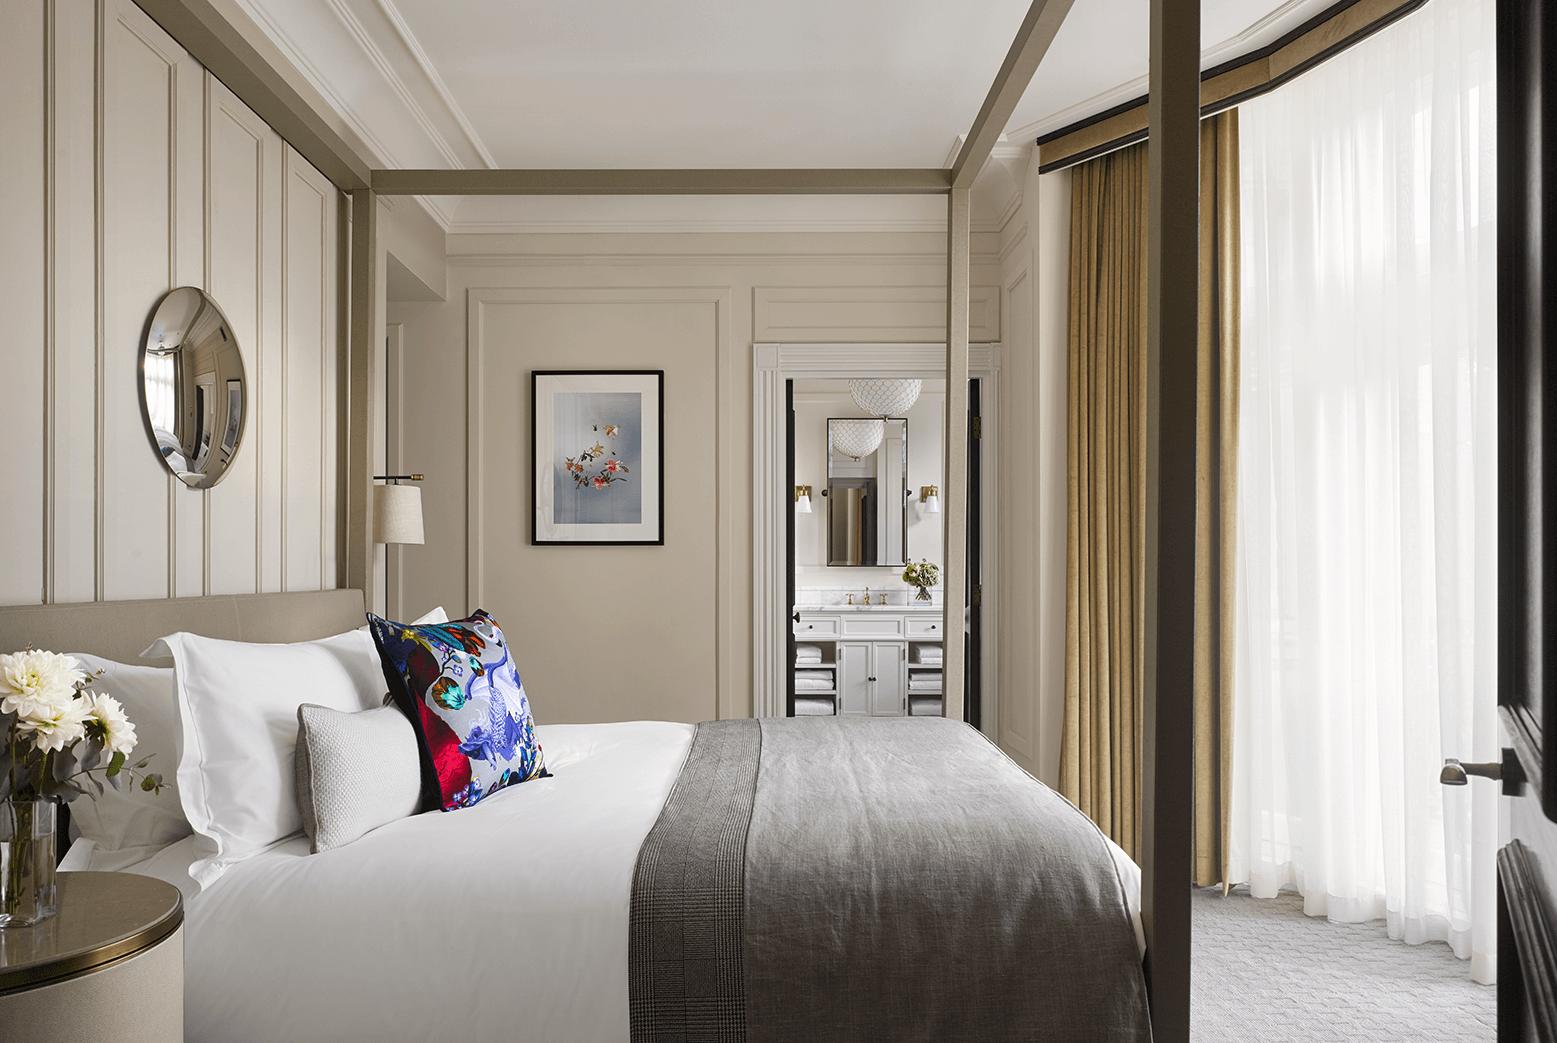 The Kimpton Fitzroy Hotel London In goop Health